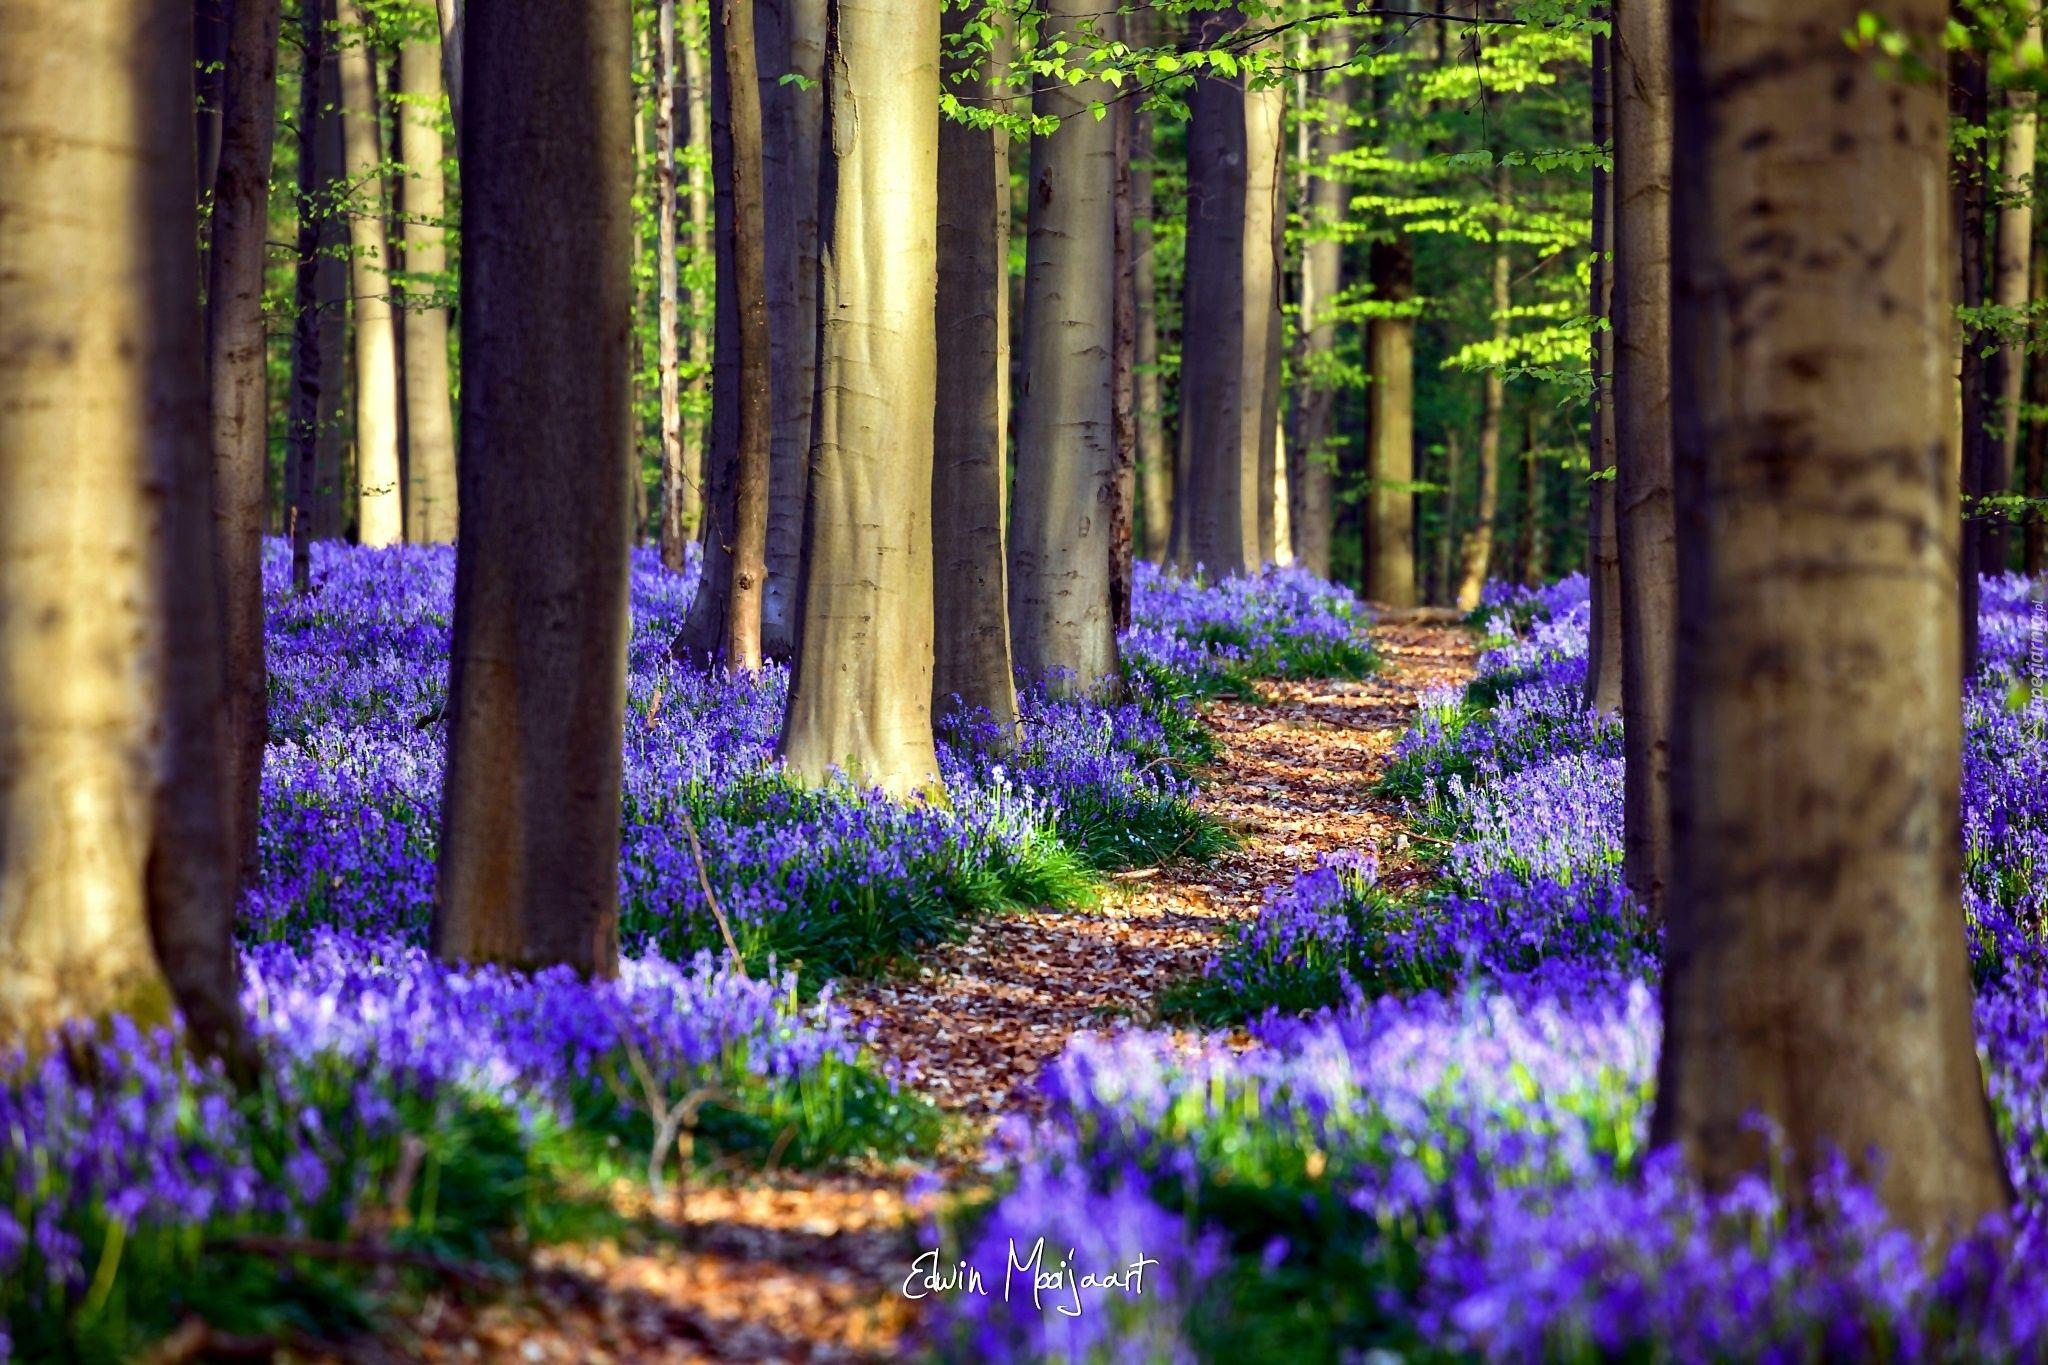 Las Kwiaty Sciezka Wiosna Belgia Nature Photography Trees Nature Photography Mother Nature Goddess